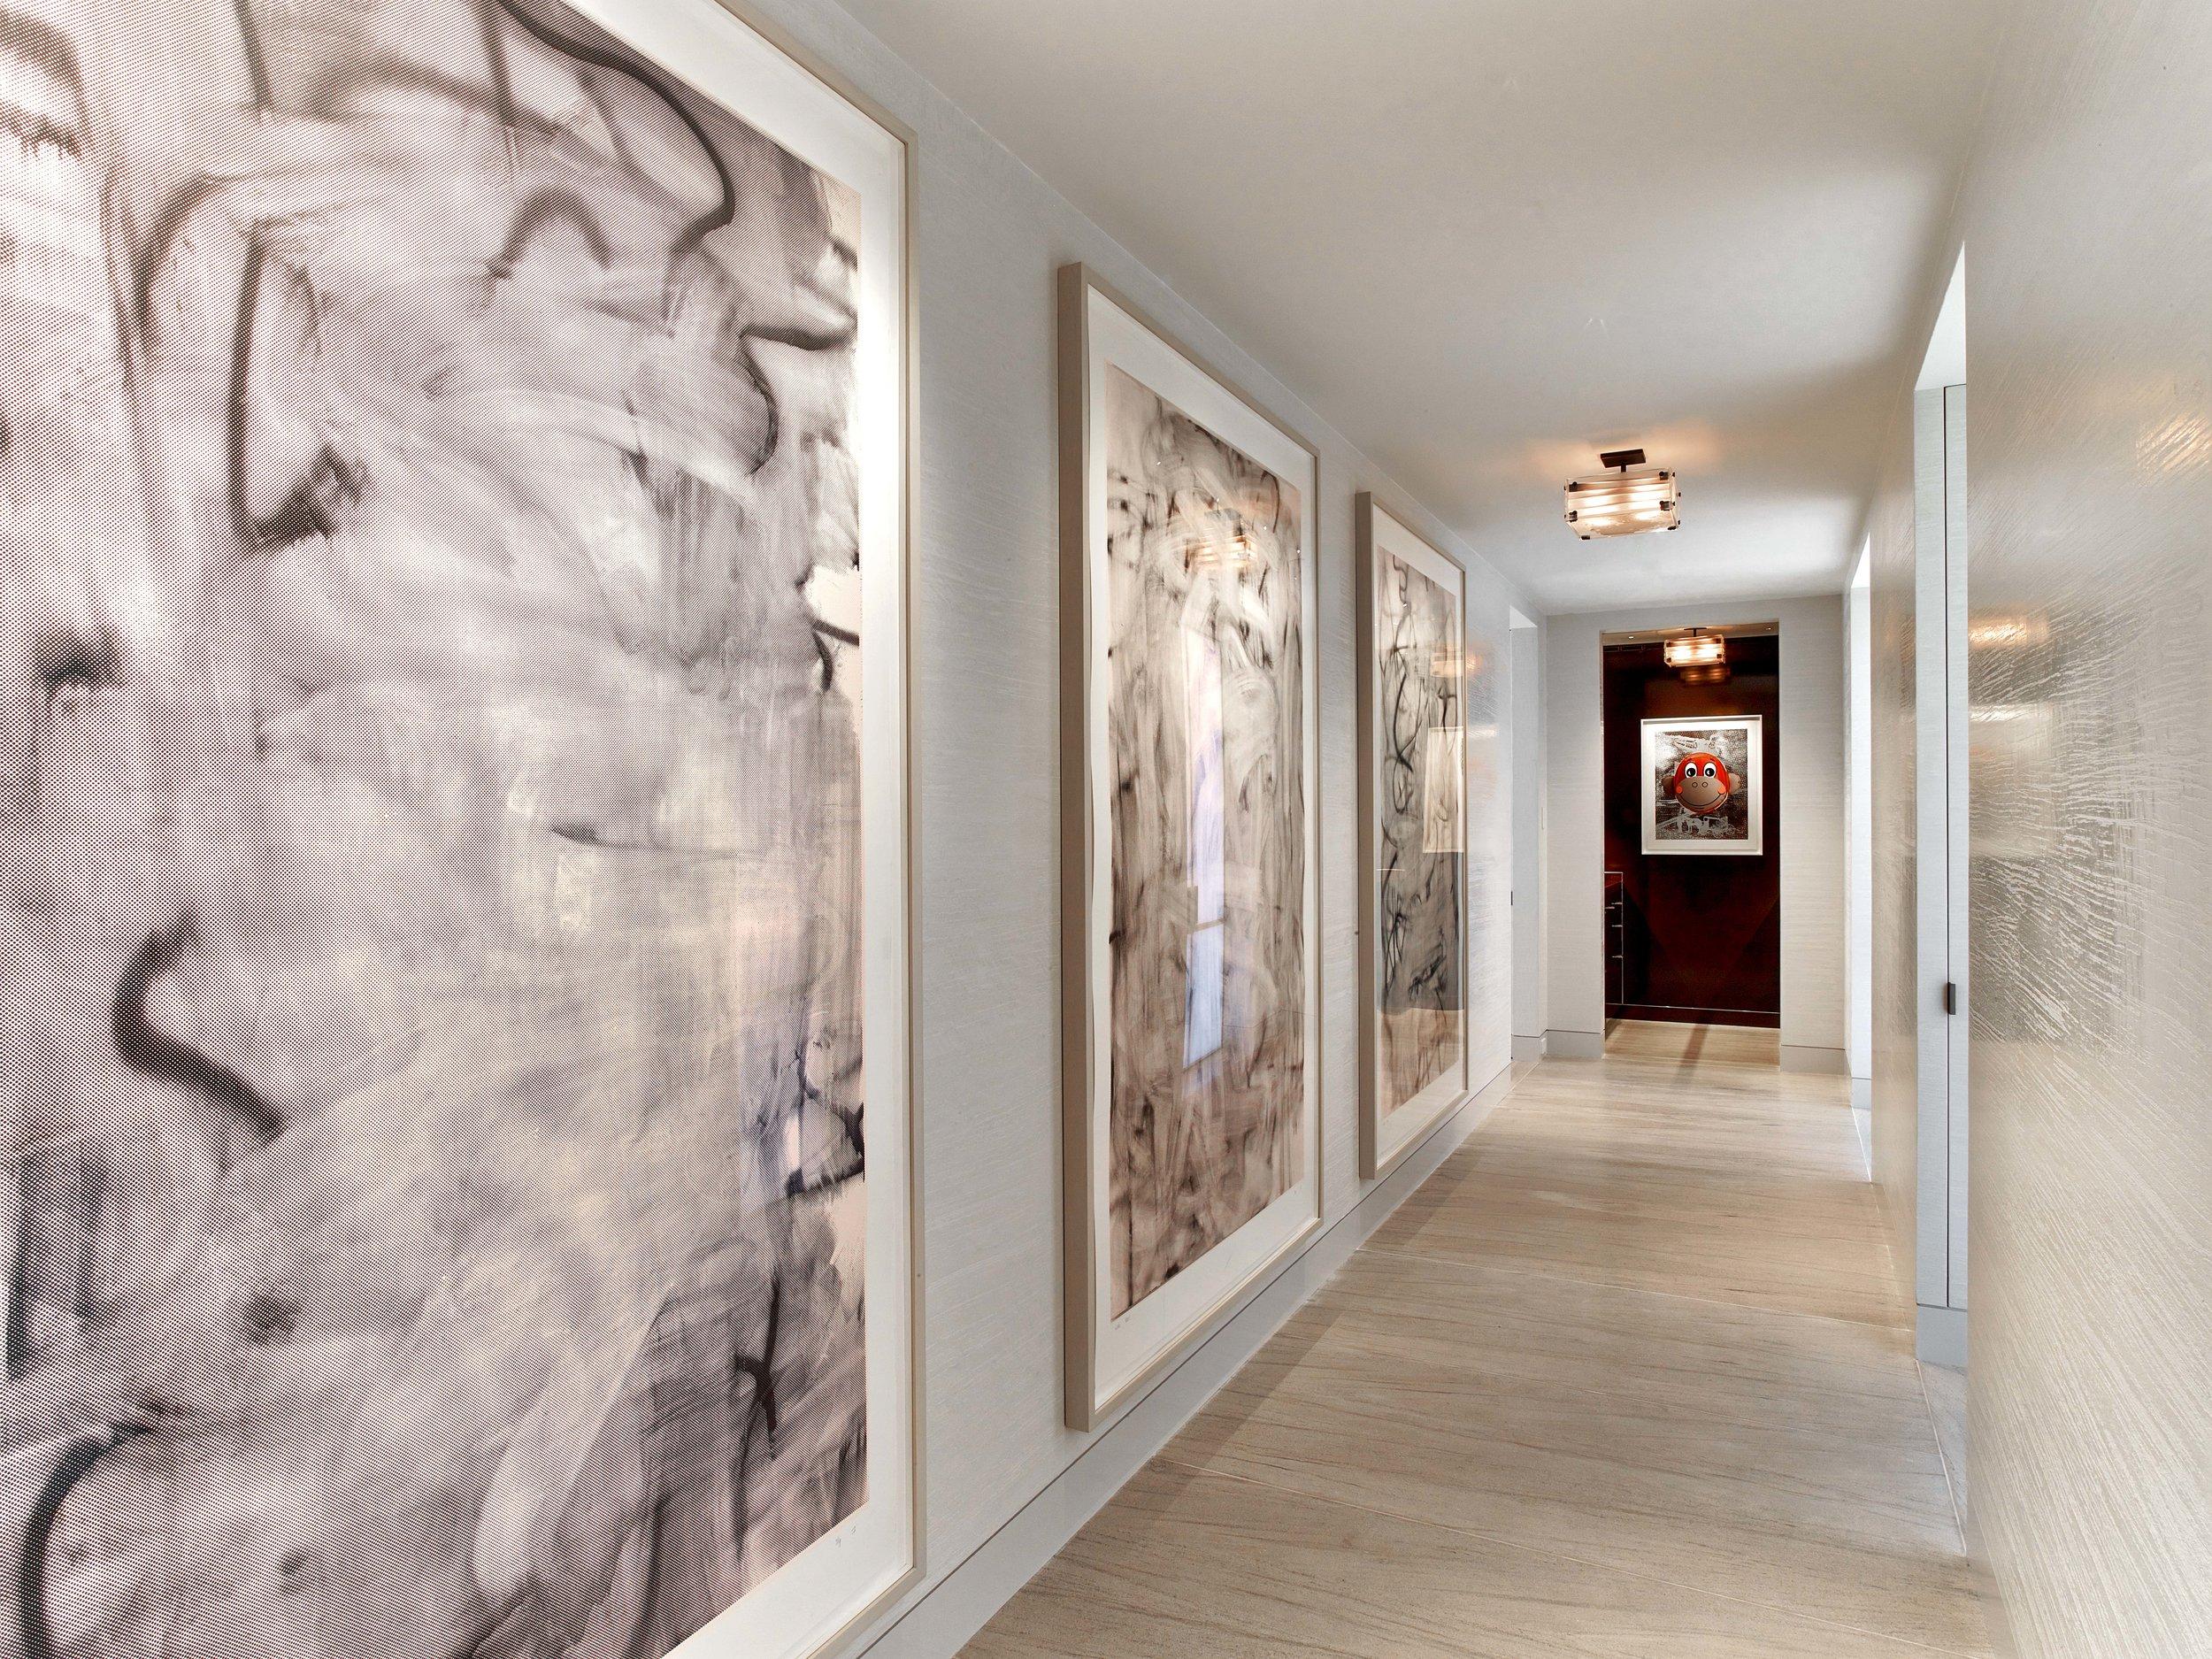 West Village Pied-a-Terre Gallery